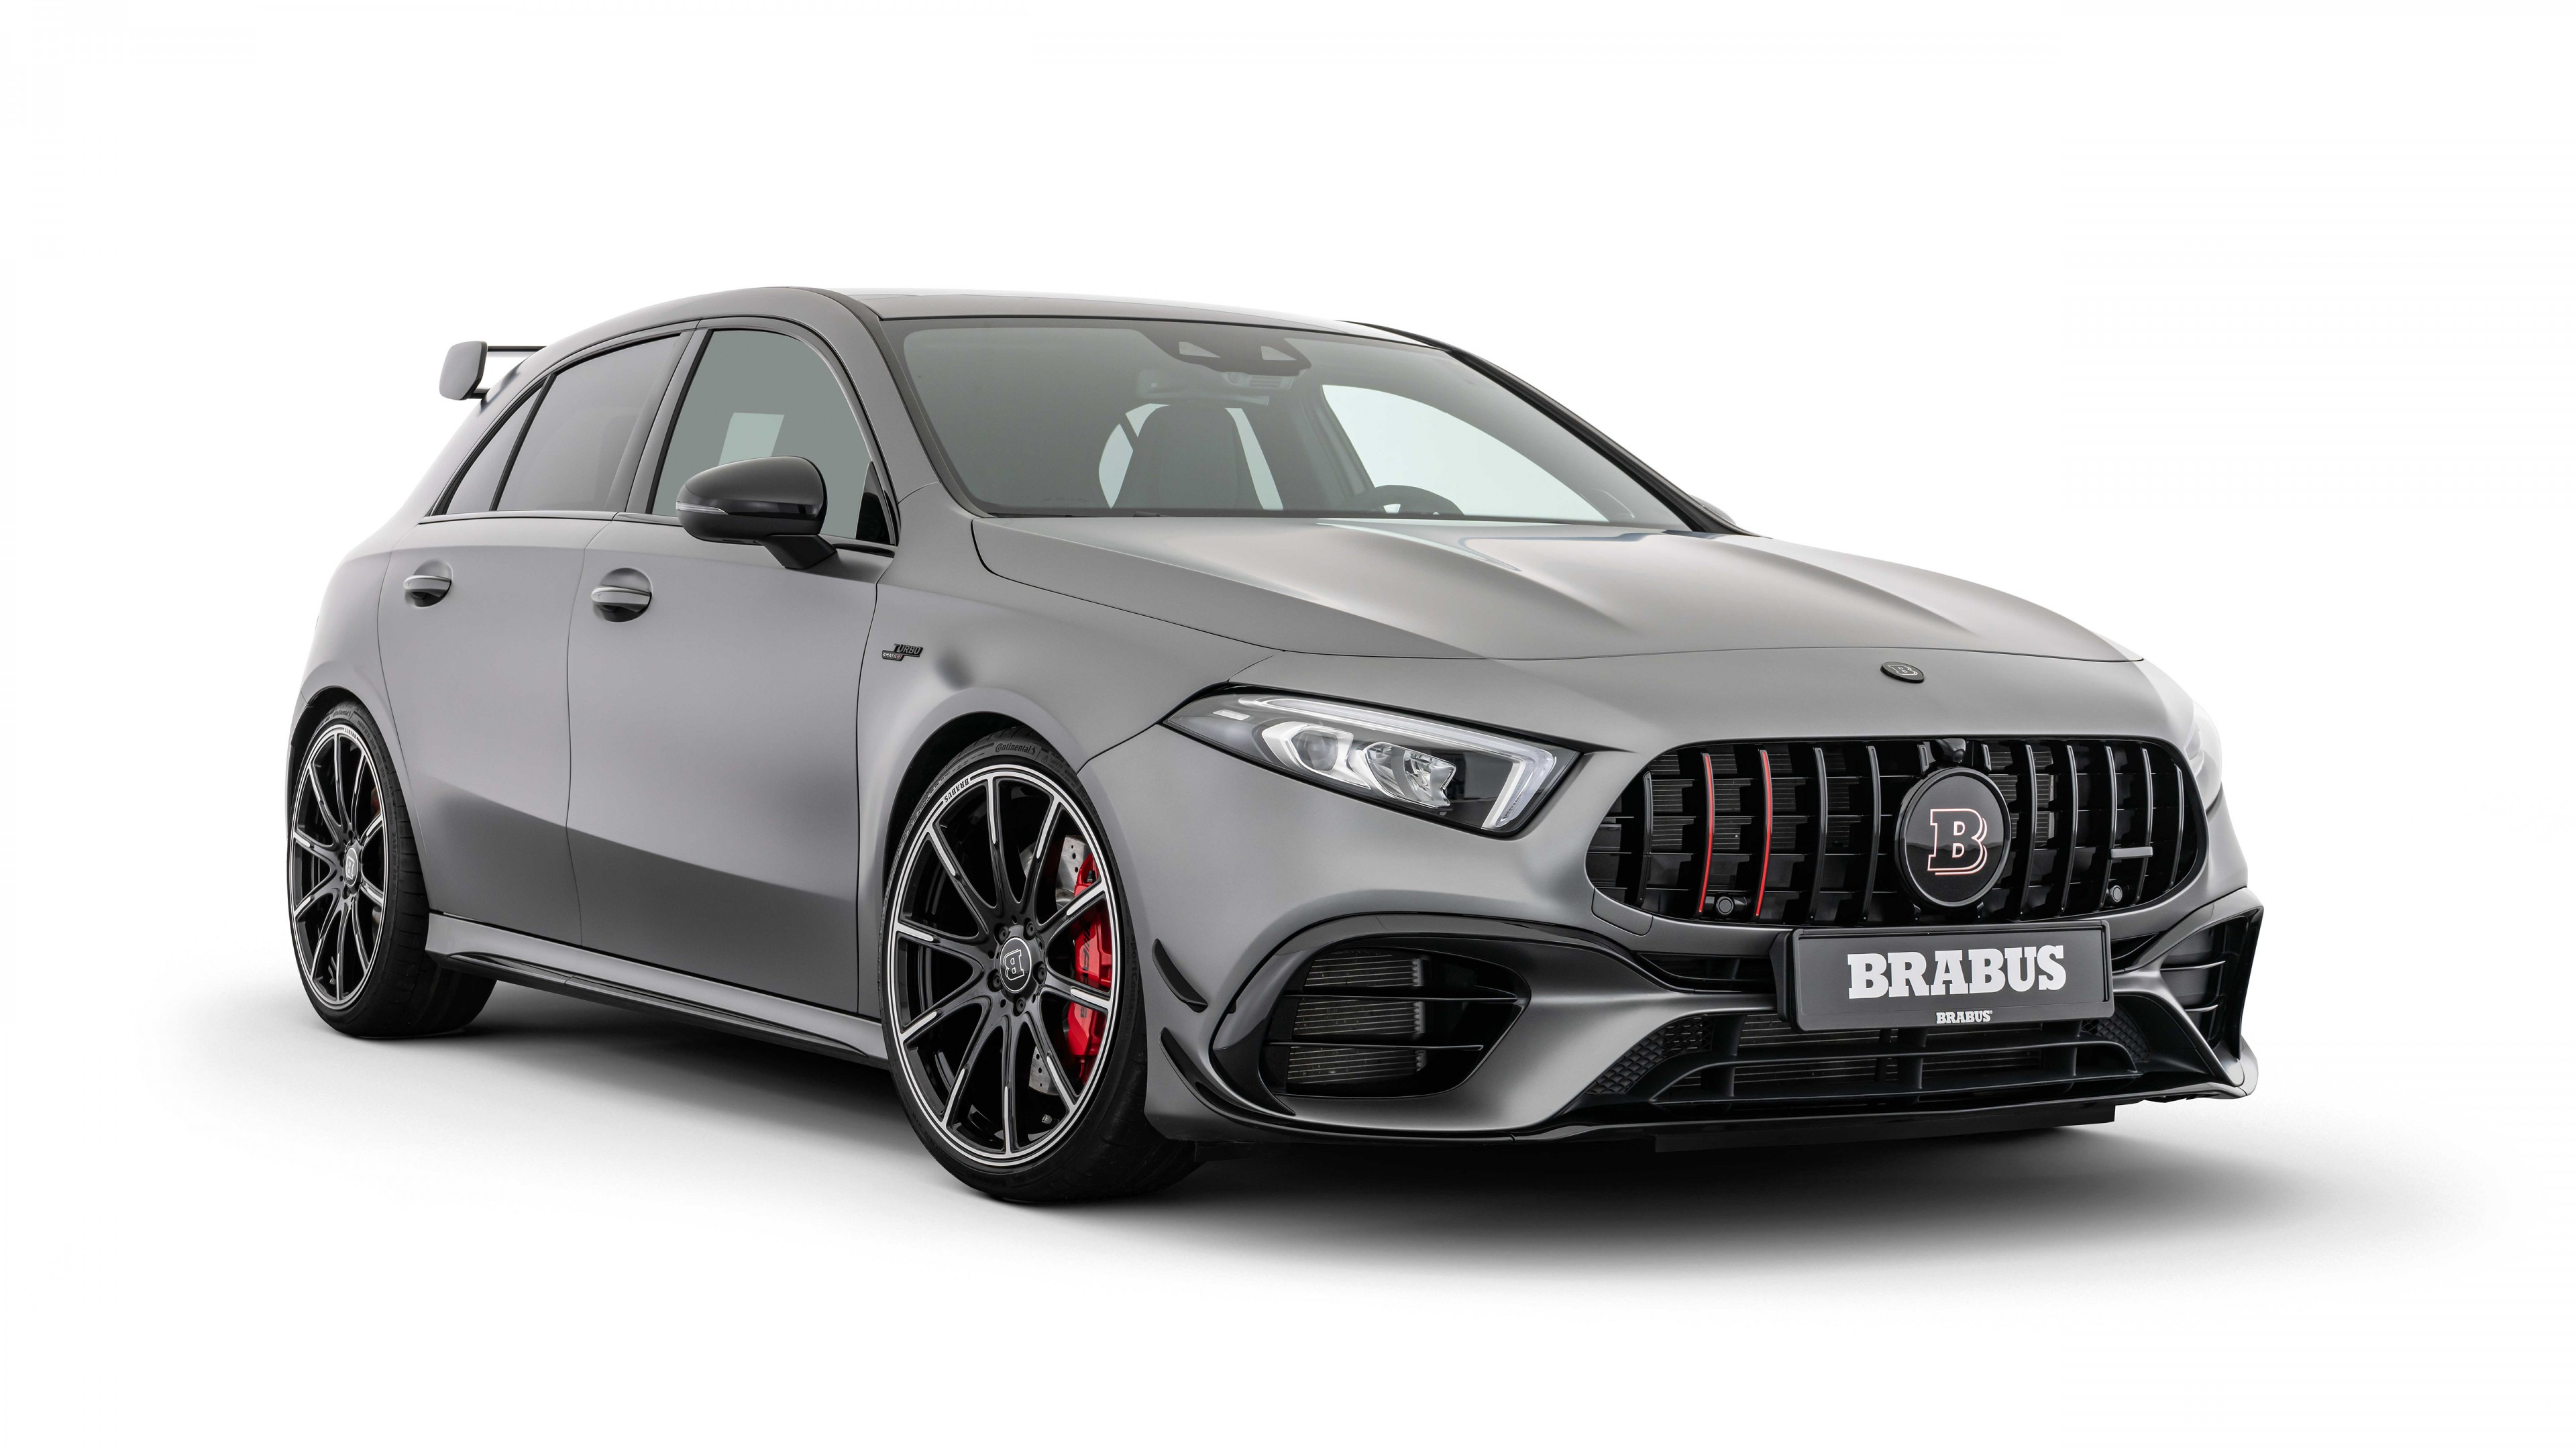 Brabus B45 Mercedes-AMG A45 S 2021 4K 2 Wallpaper | HD Car ...